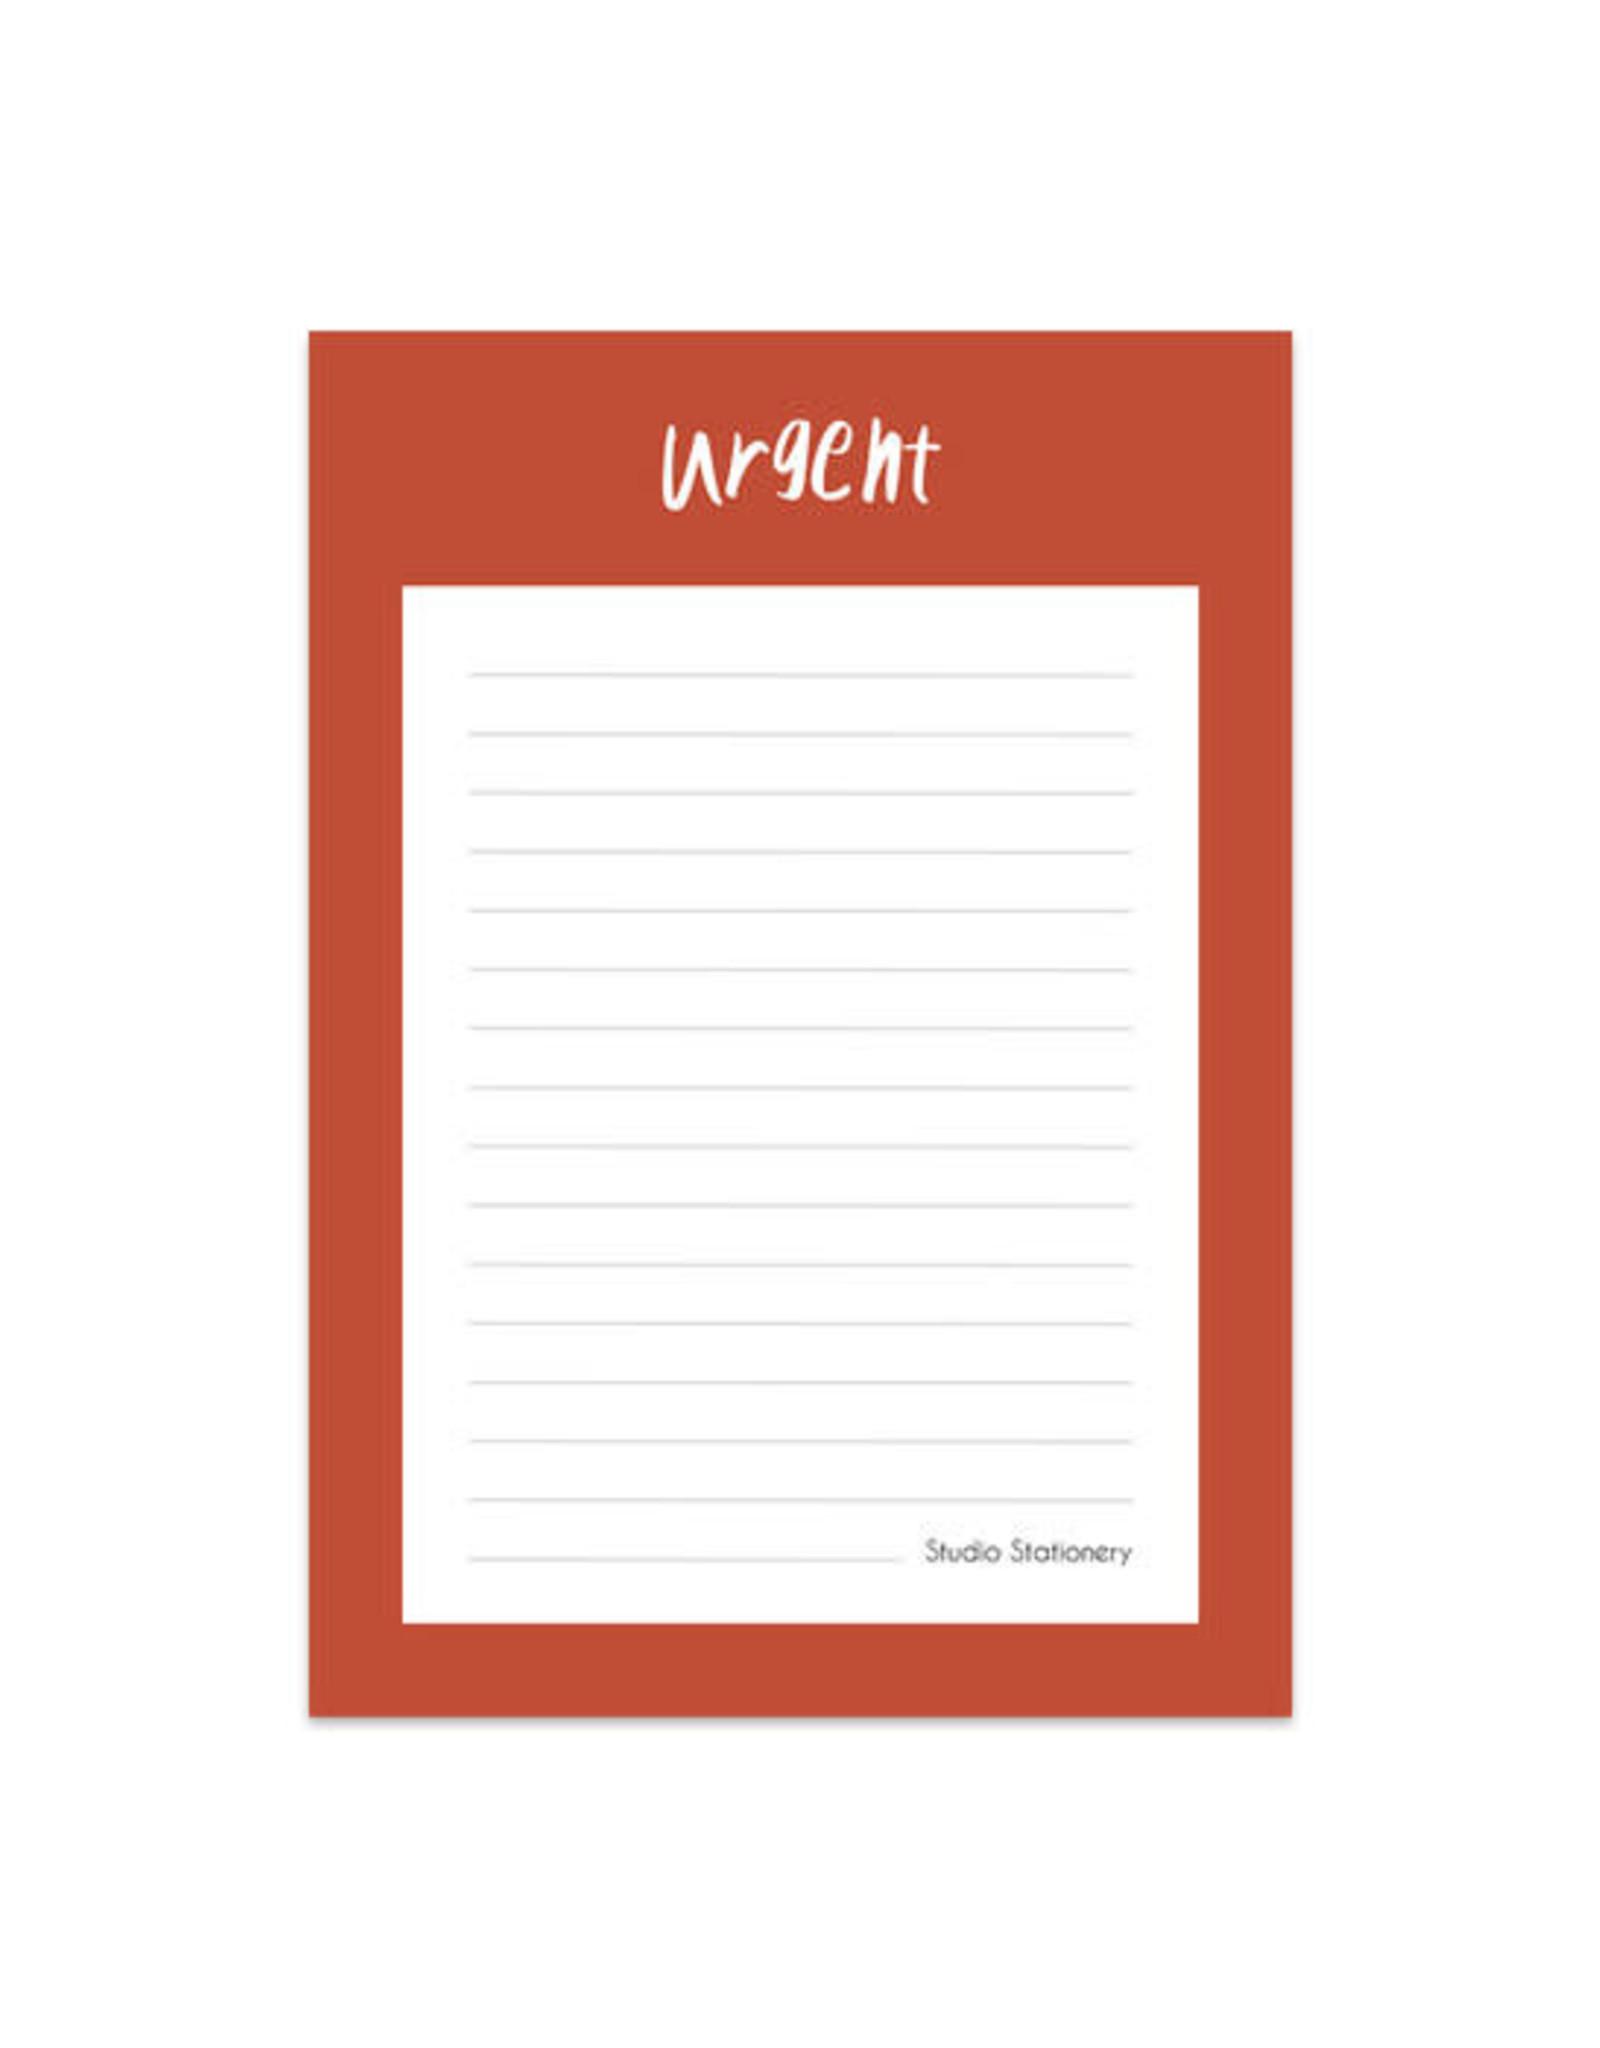 studio stationery Studio stationery noteblock urgent